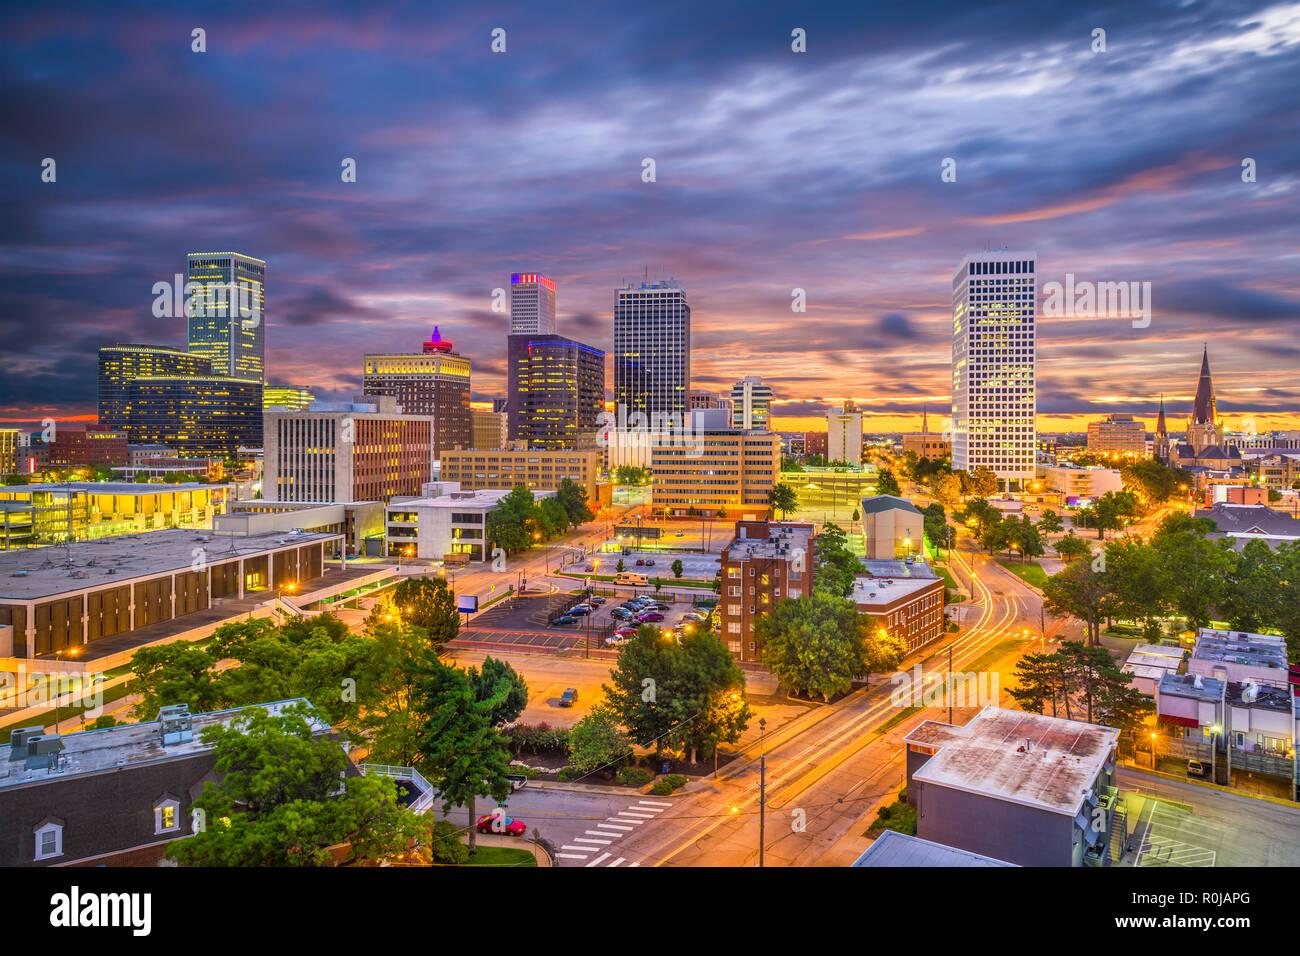 Tulsa, Oklahoma, USA skyline at twilight. - Stock Image